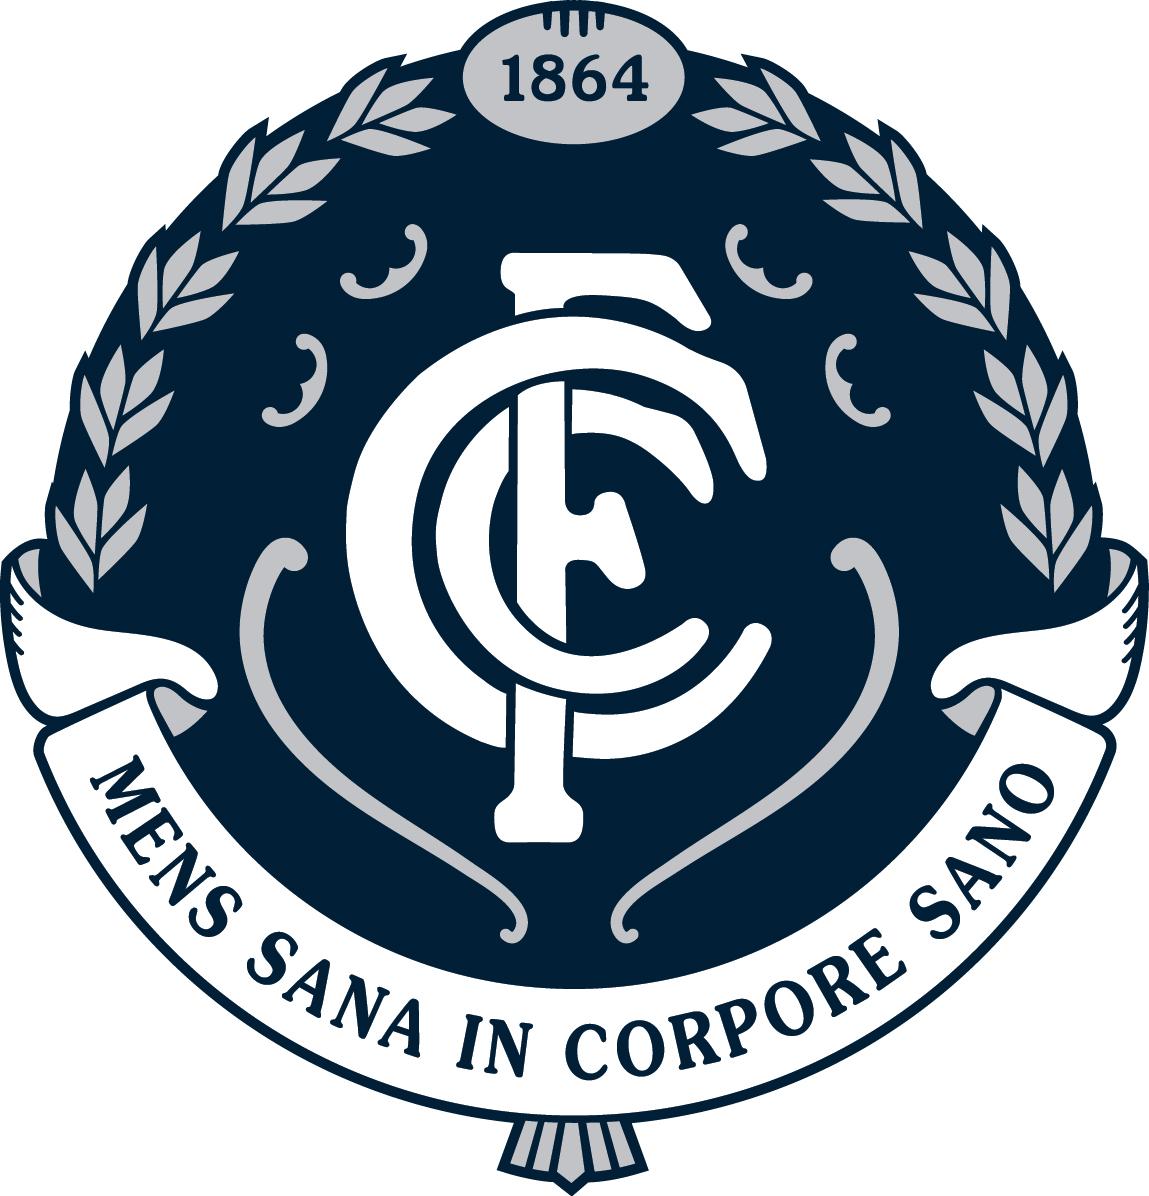 Carlton football Club Logo